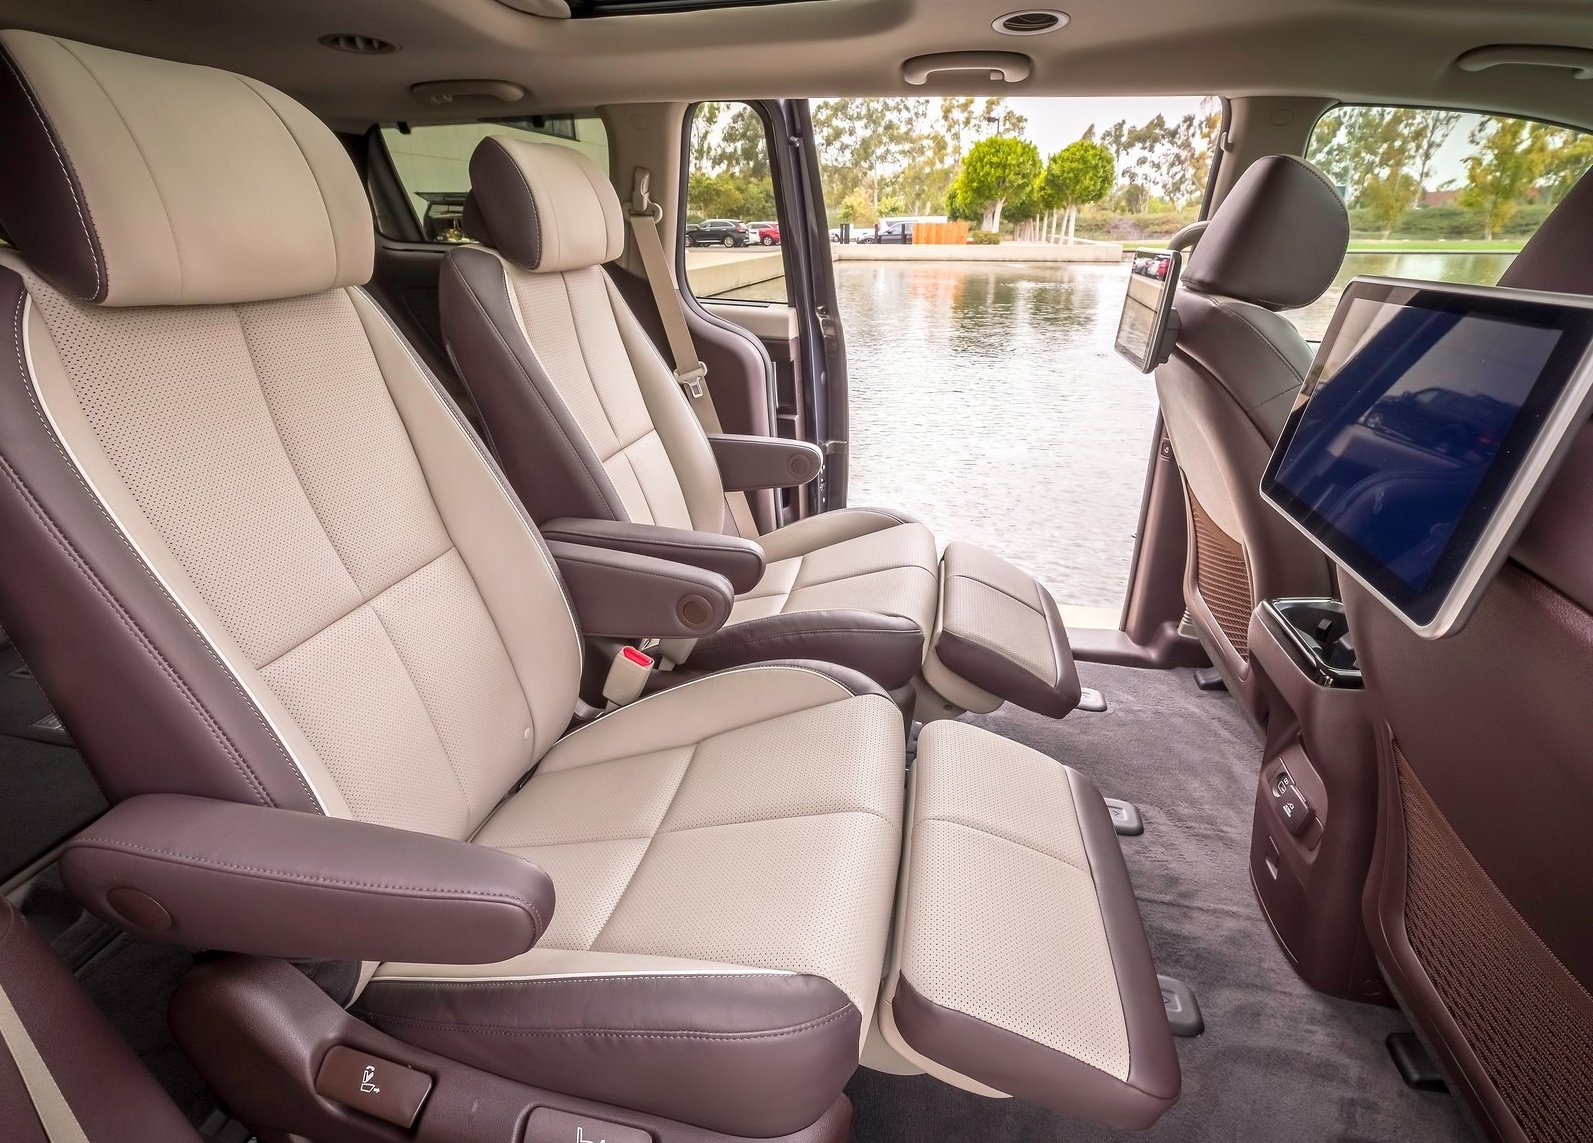 2019 Kia Carnival Facelift Revealed V6 Gets 8 Speed Auto